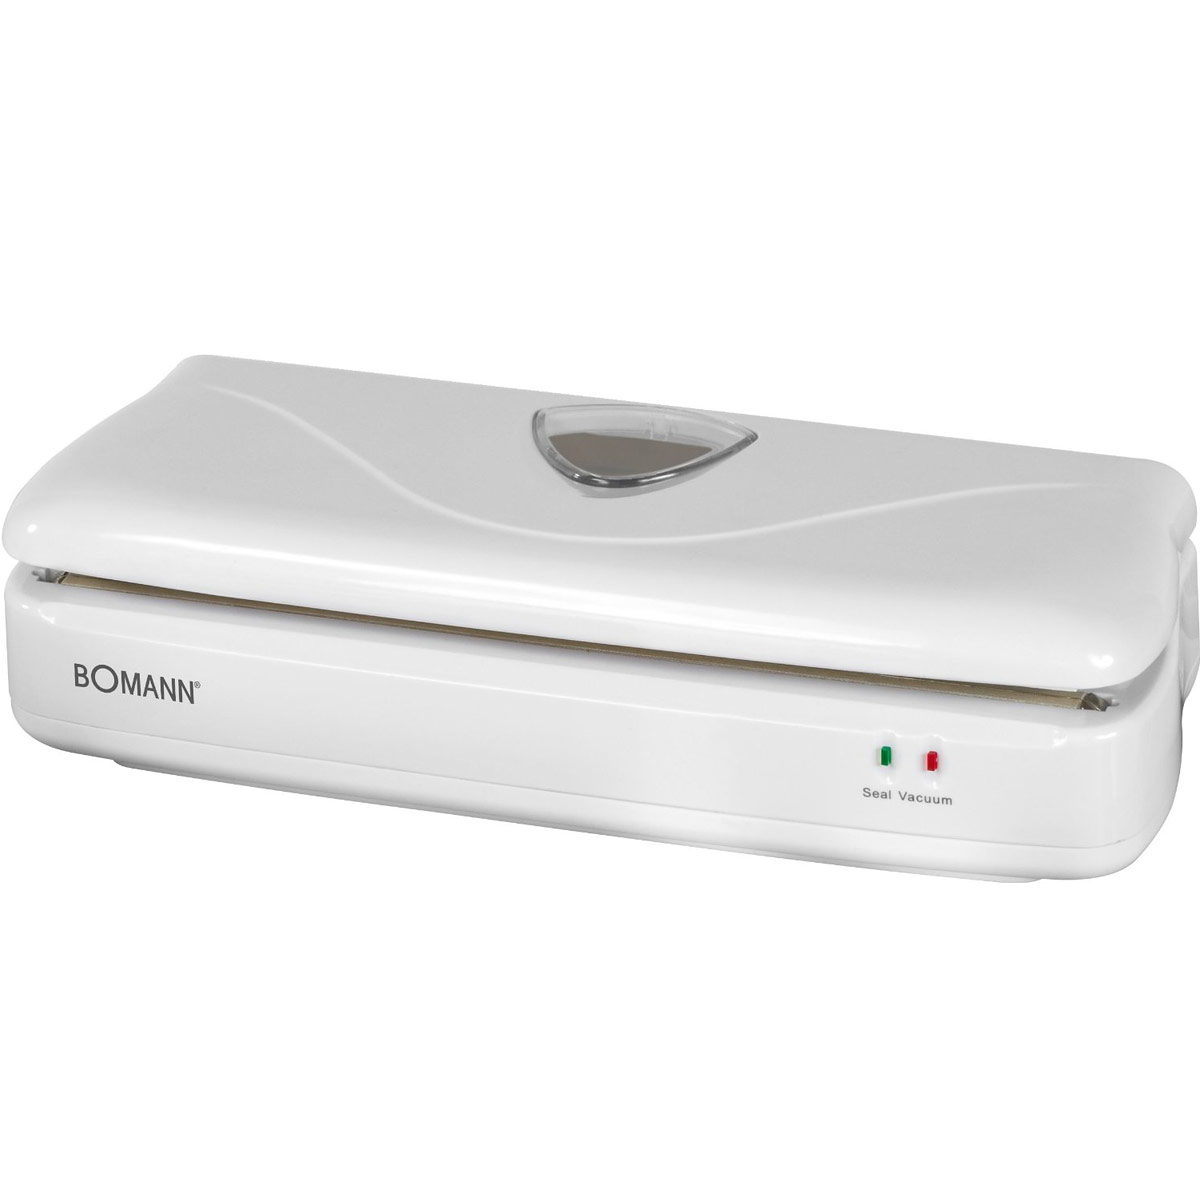 Вакуумный упаковщик Bomann FS 1014 CB, White все цены